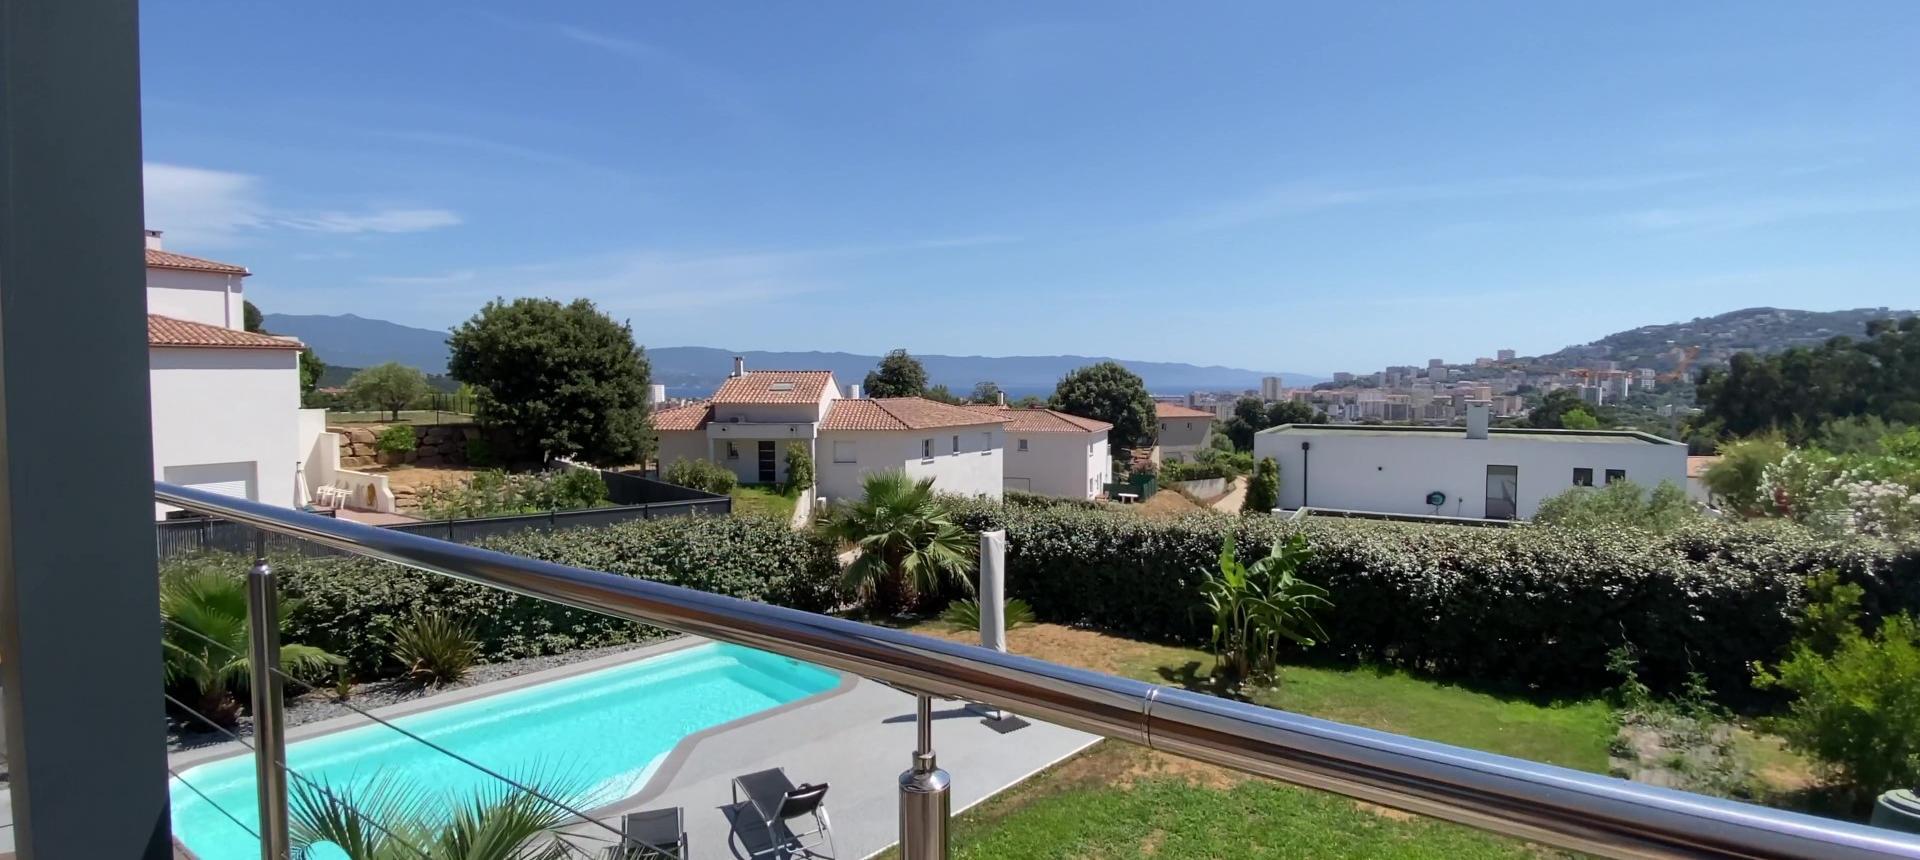 Villa d'architecte à vendre à AJACCIO terrasse